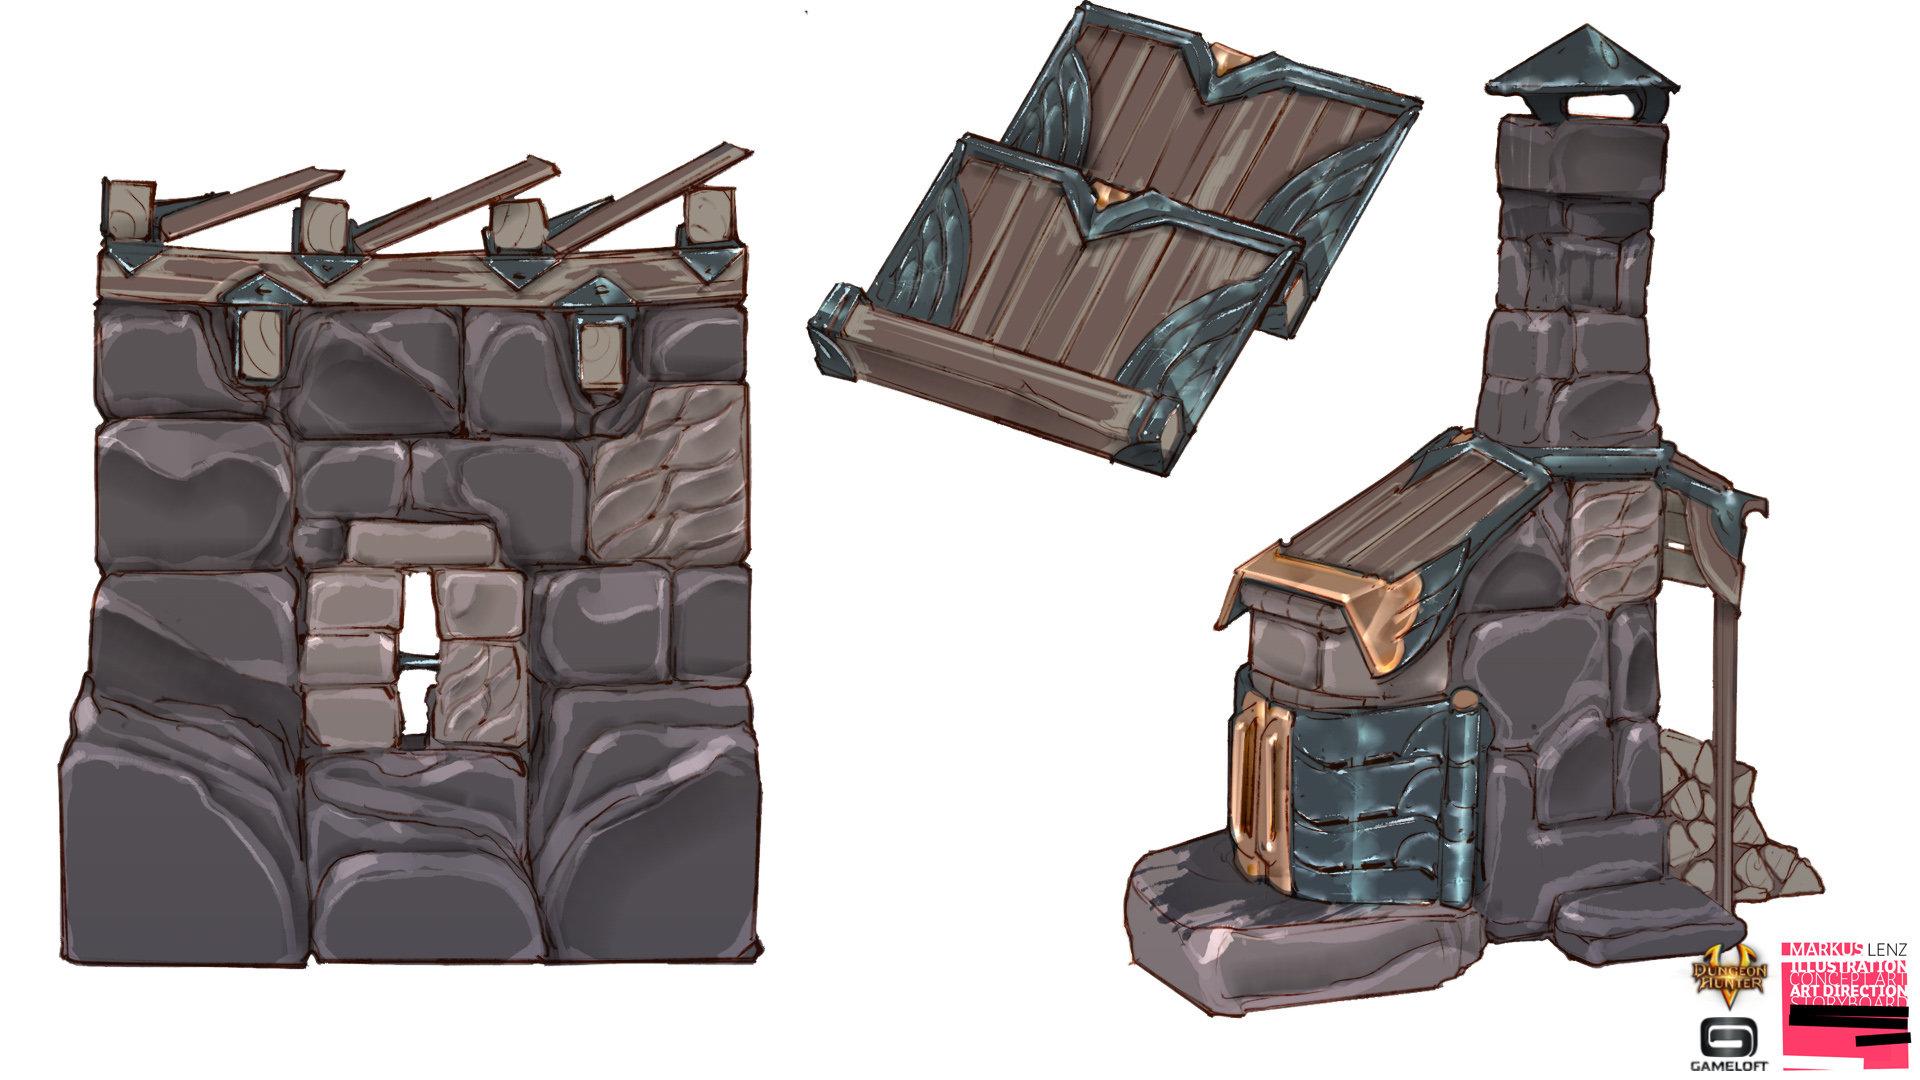 Markus lenz gameloft dh5 valenoutpost walls 04 ml